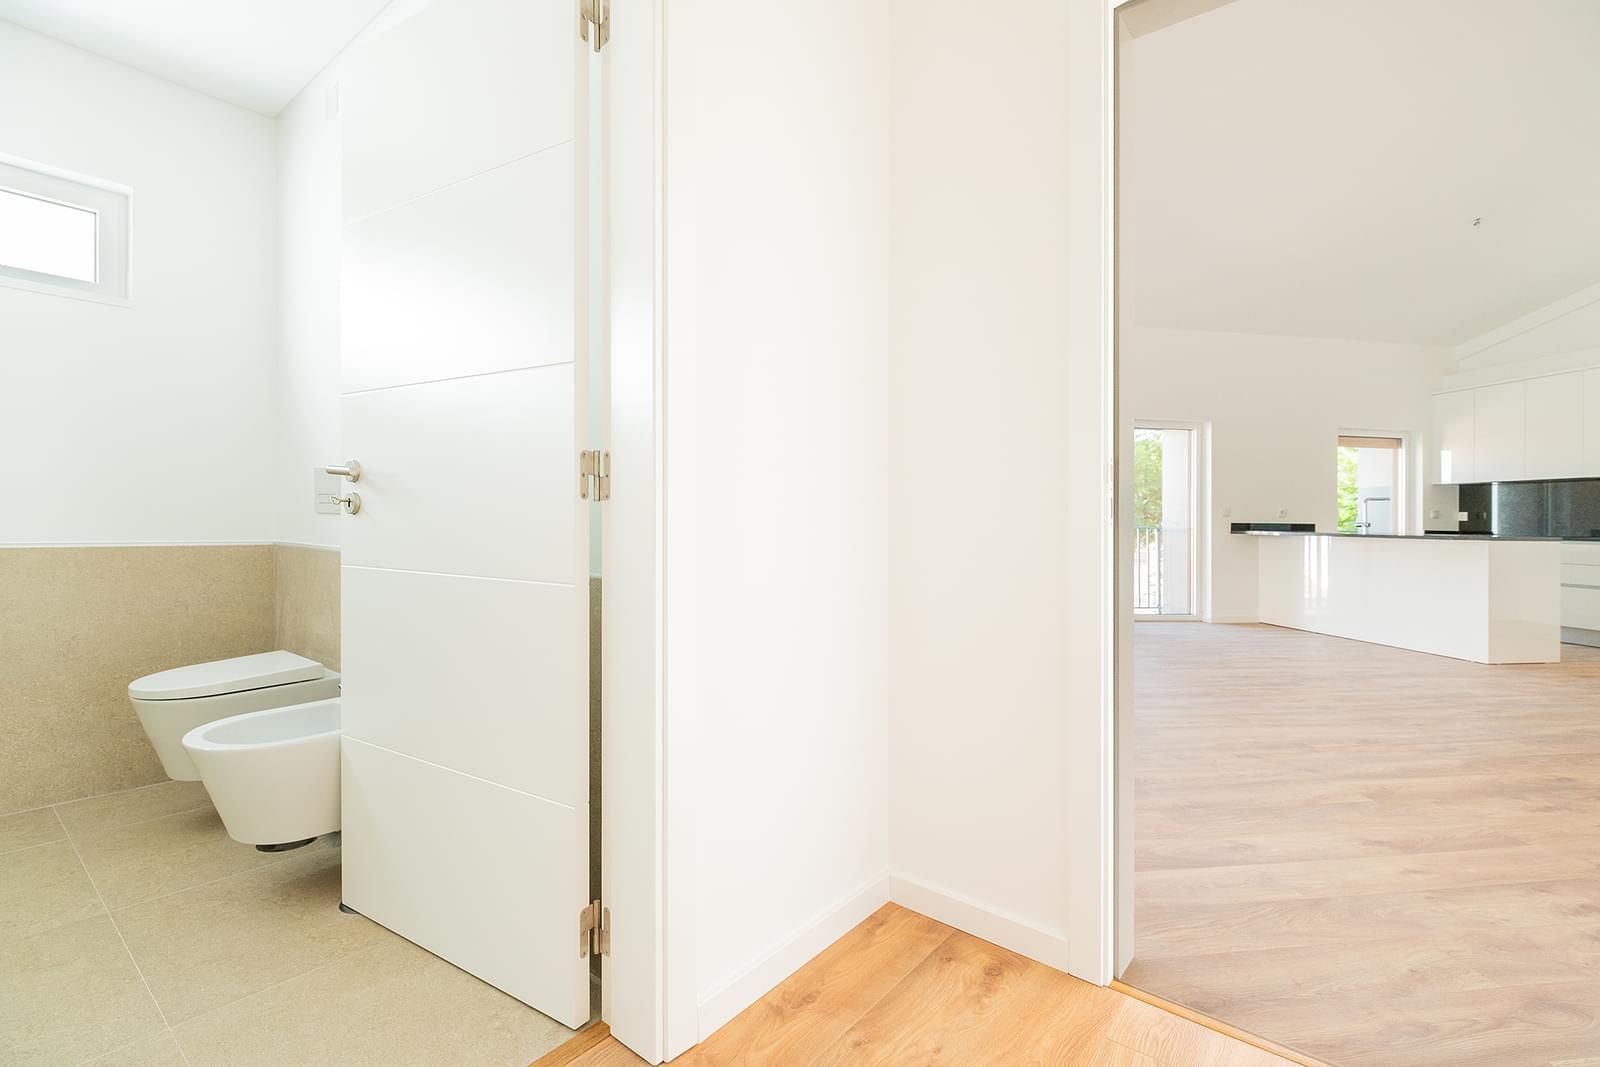 pf18413-apartamento-t1-lisboa-b1a3f00c-4dad-4aa3-a29d-1e100b9615e4